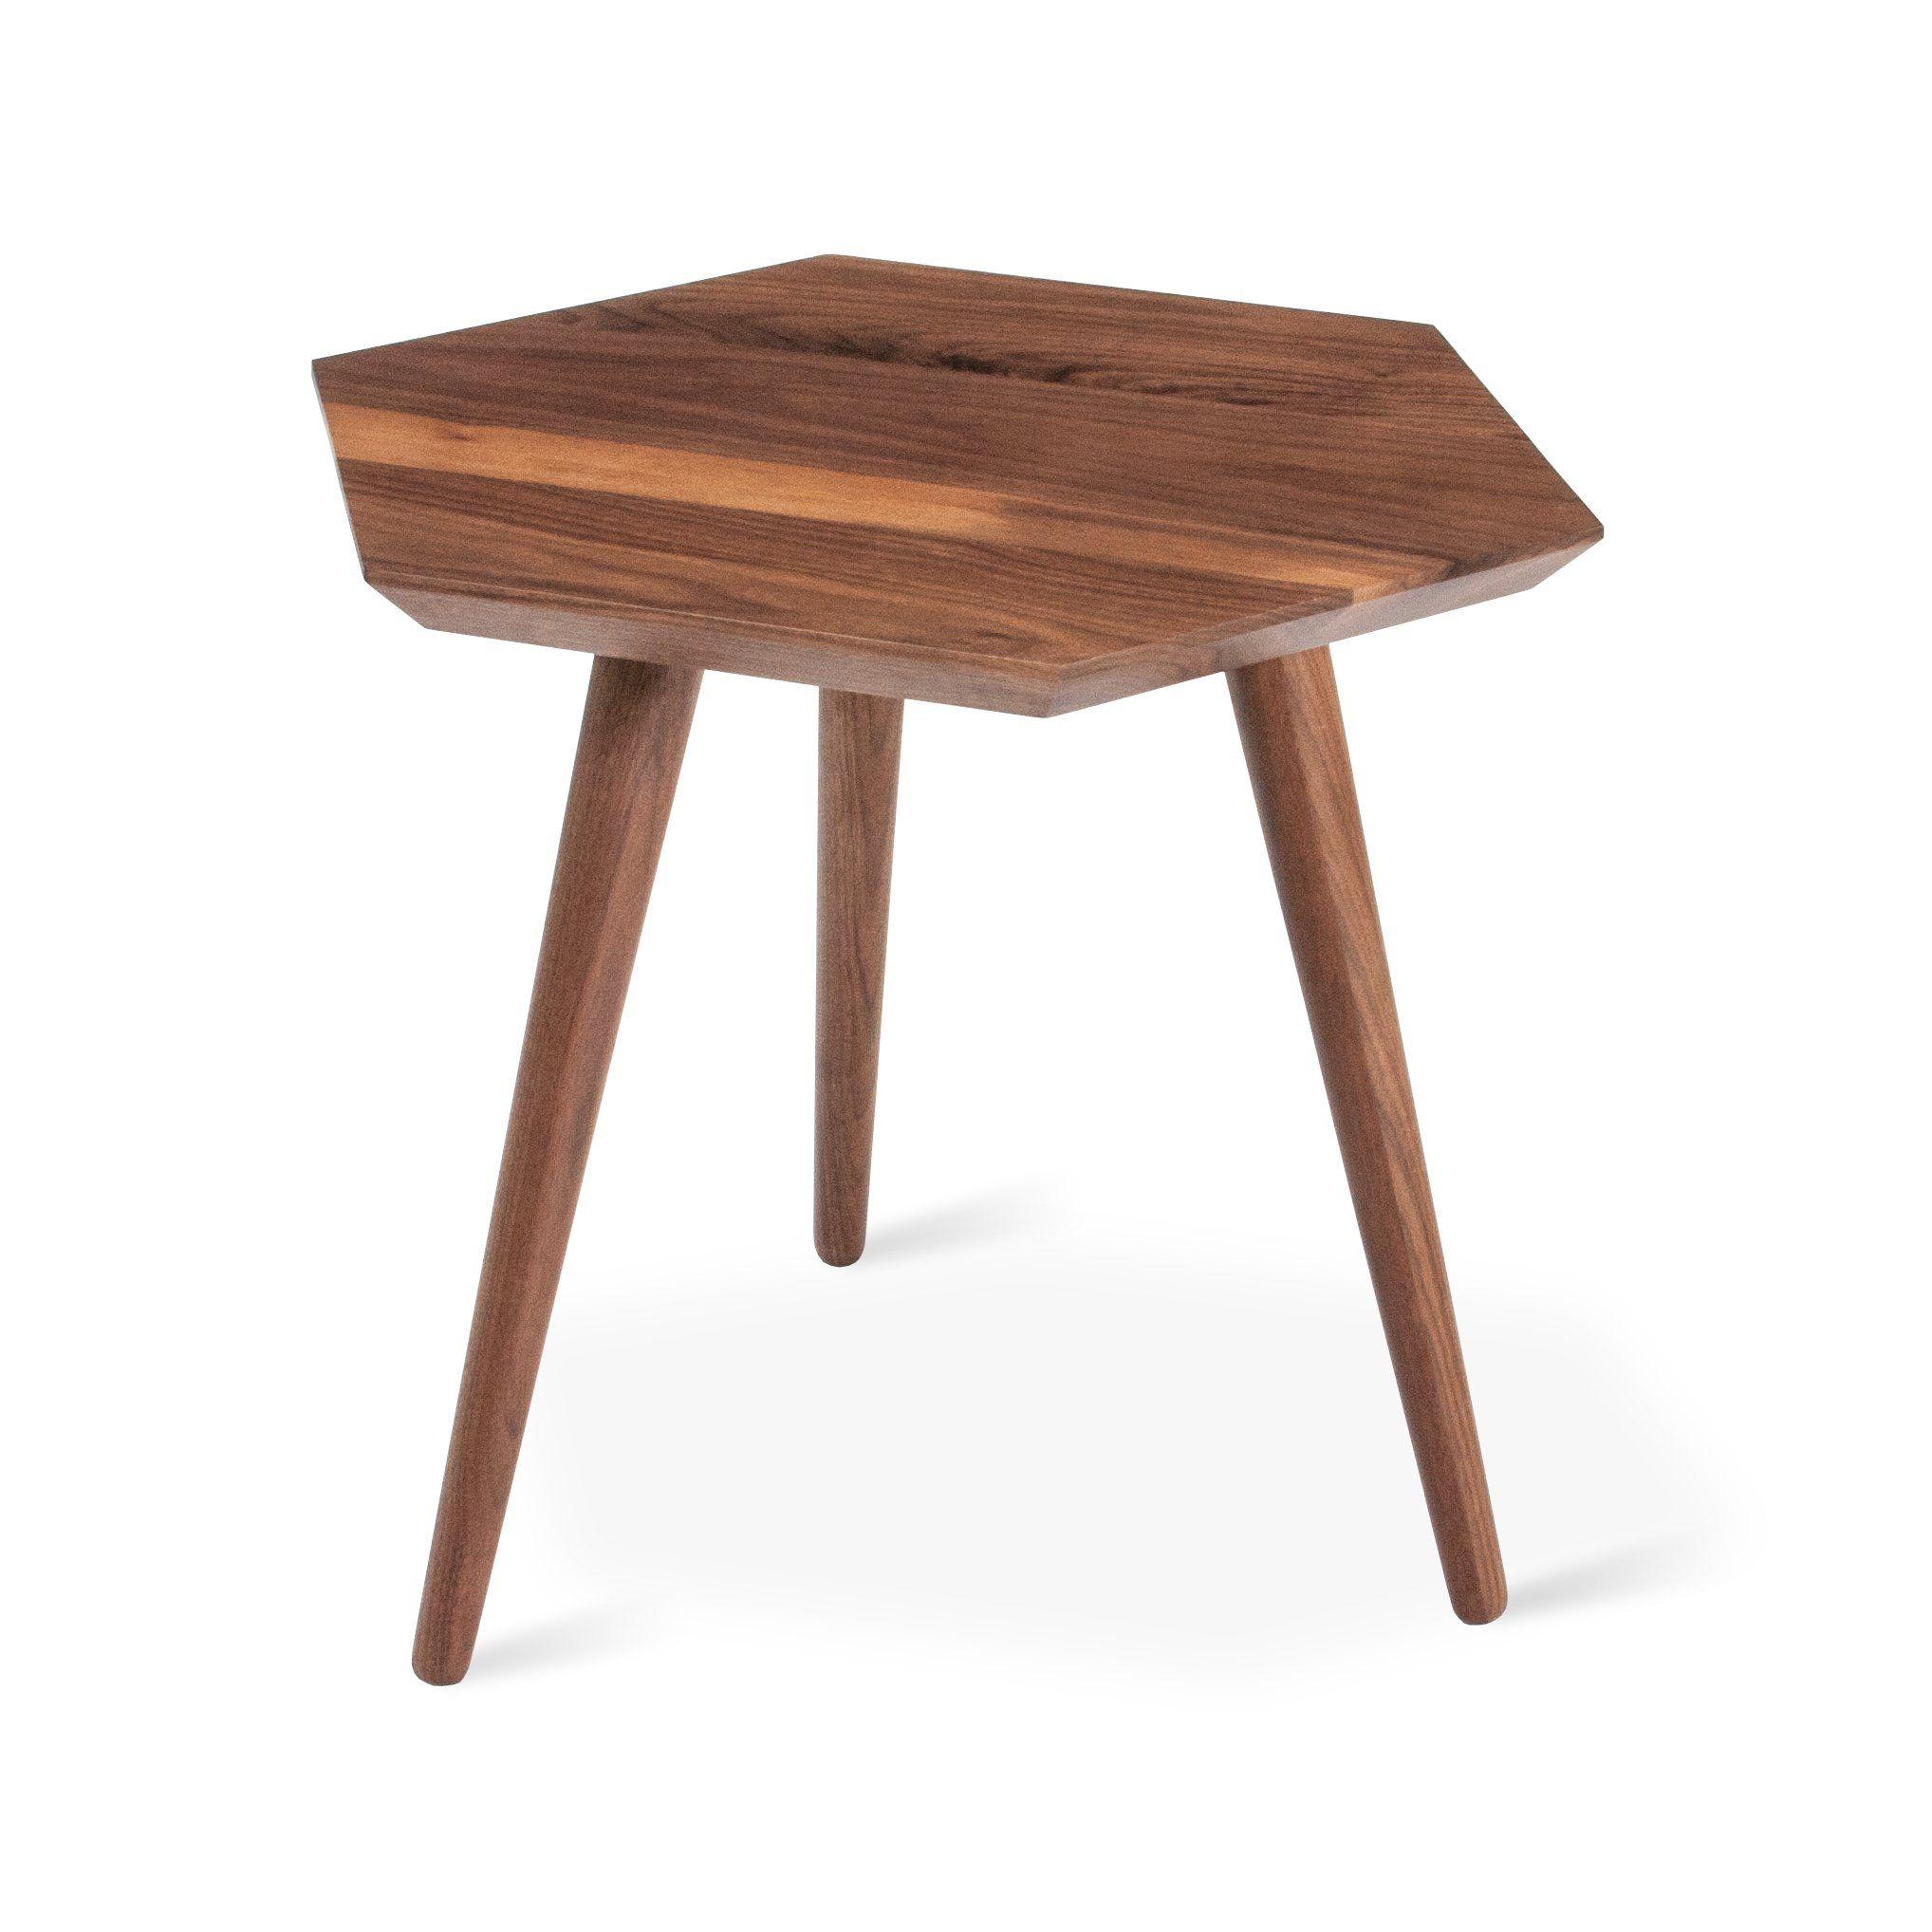 Metric End Table End Tables Gus Modern Furniture Gus Modern [ 2036 x 2036 Pixel ]